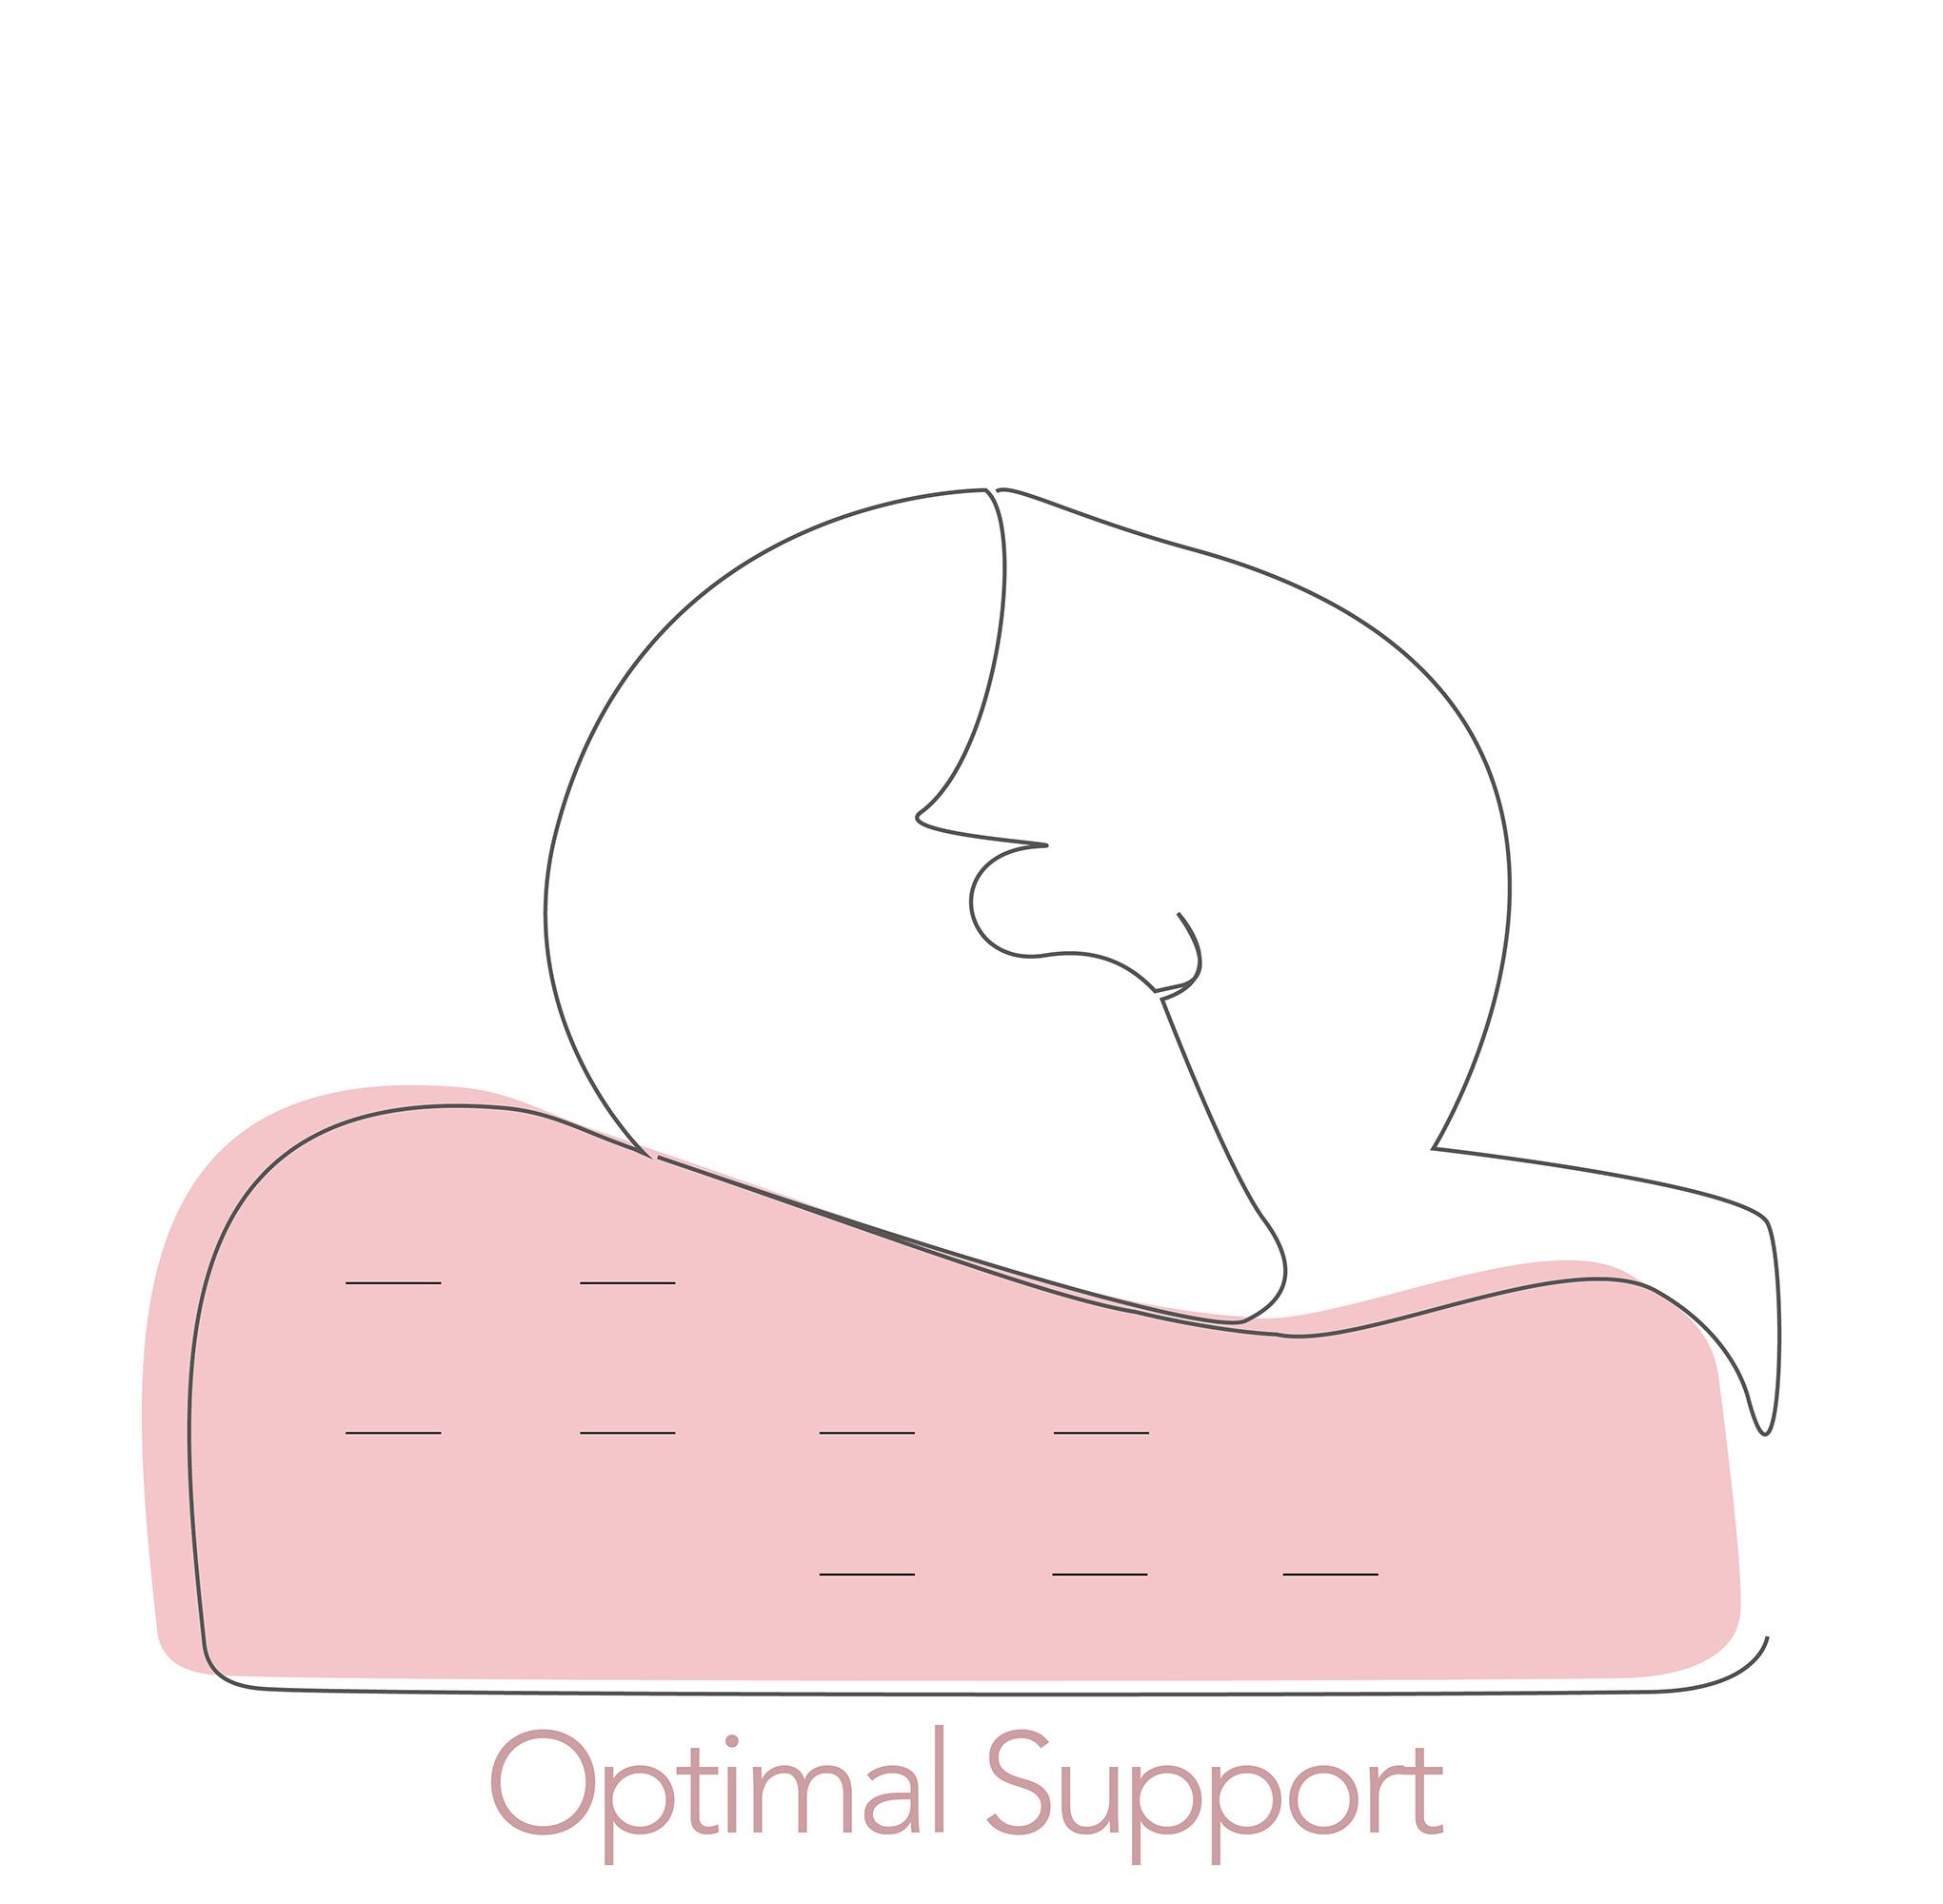 -WB Optimal Support.jpg